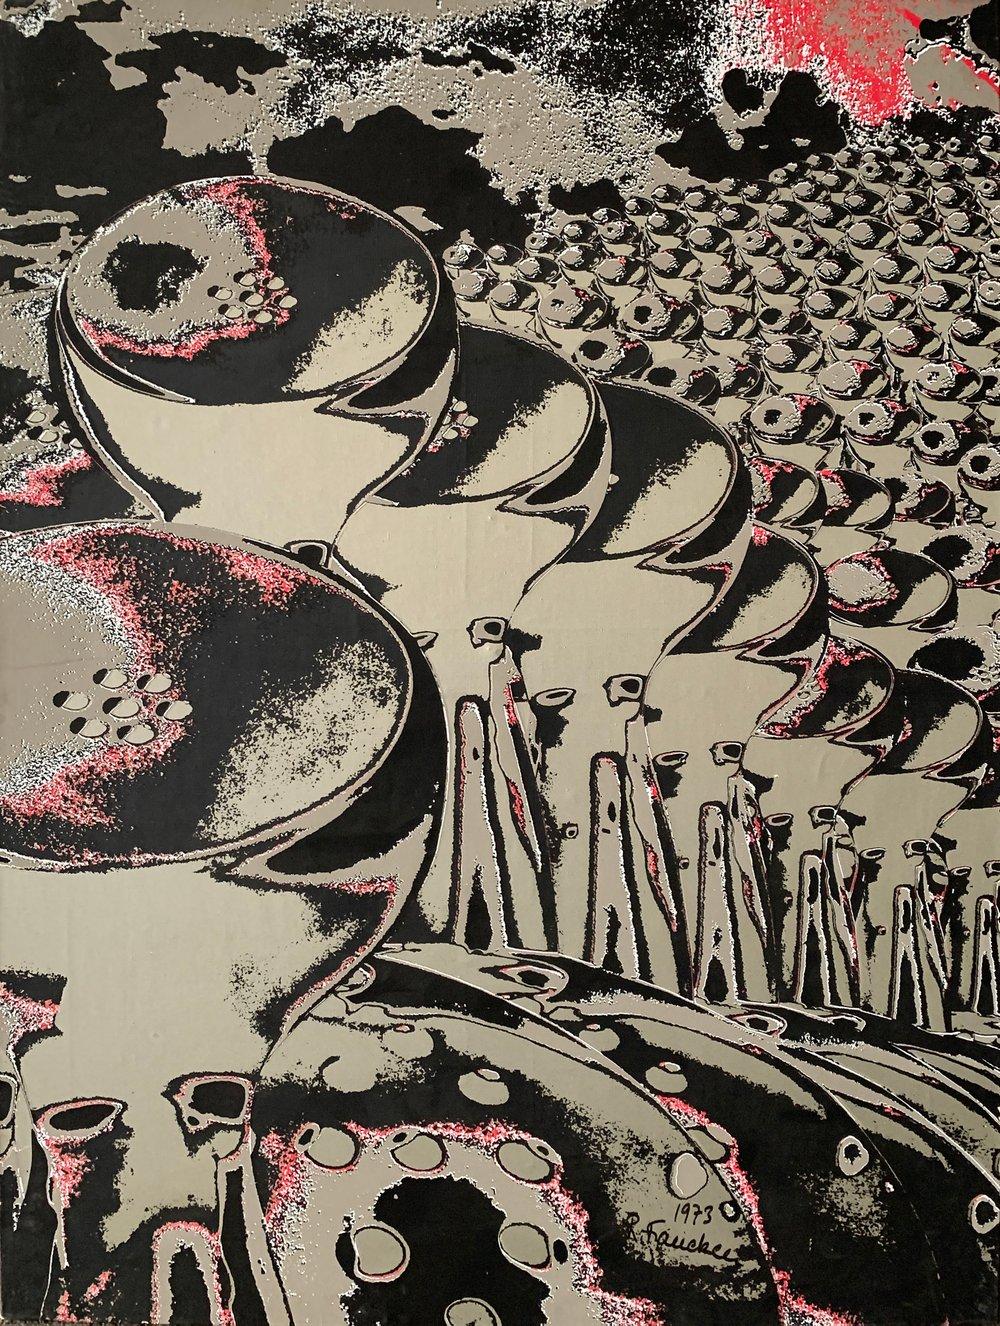 Ruth FRANCKEN - La Manif, Objekte Serie A, 1973